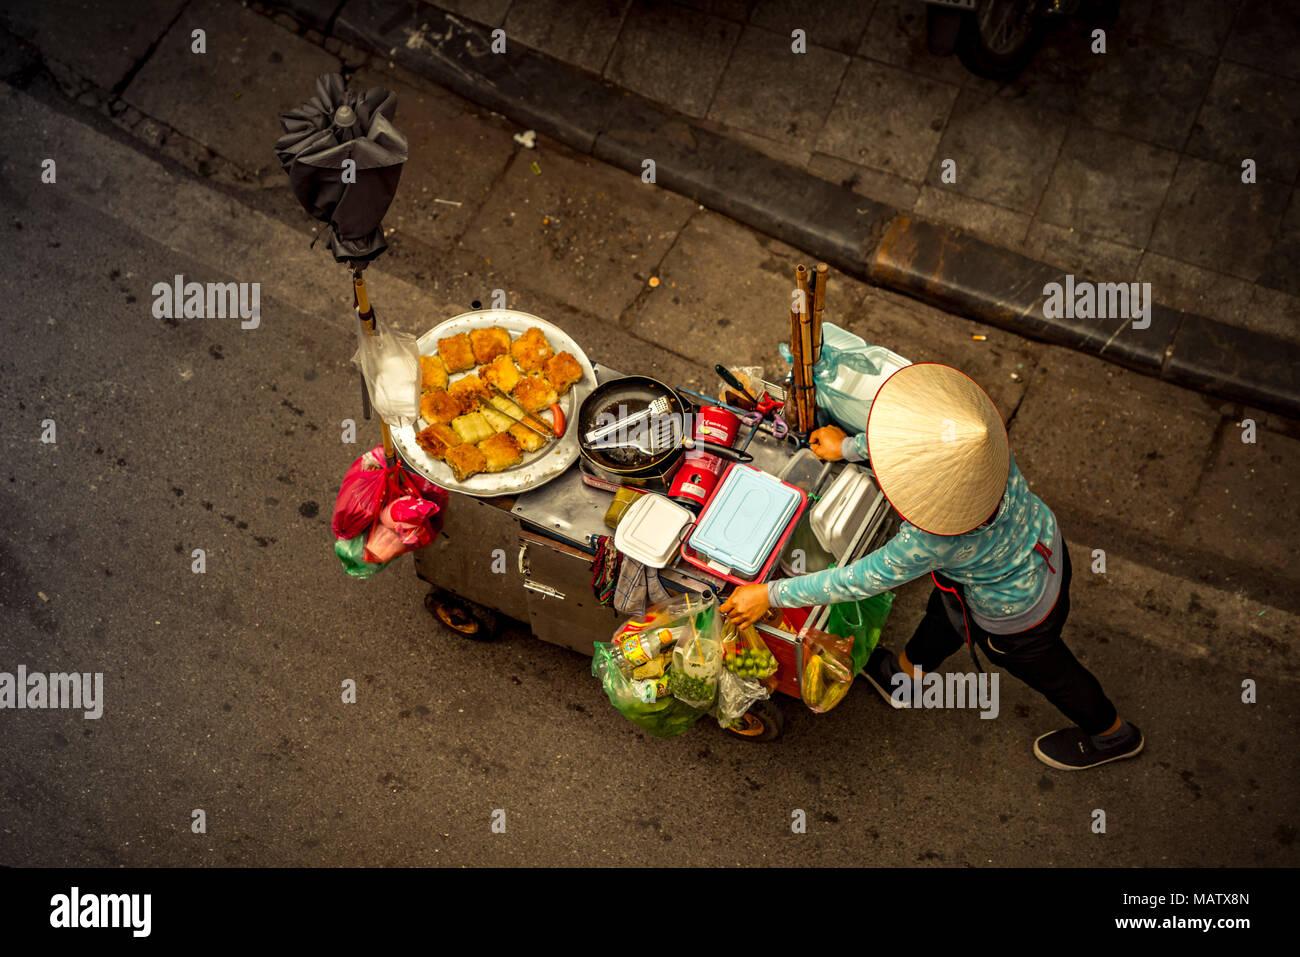 Asien, Vietnam, Hanoi, Küche, Garküche, Verkehr, Transport, Transportmittel - Stock Image